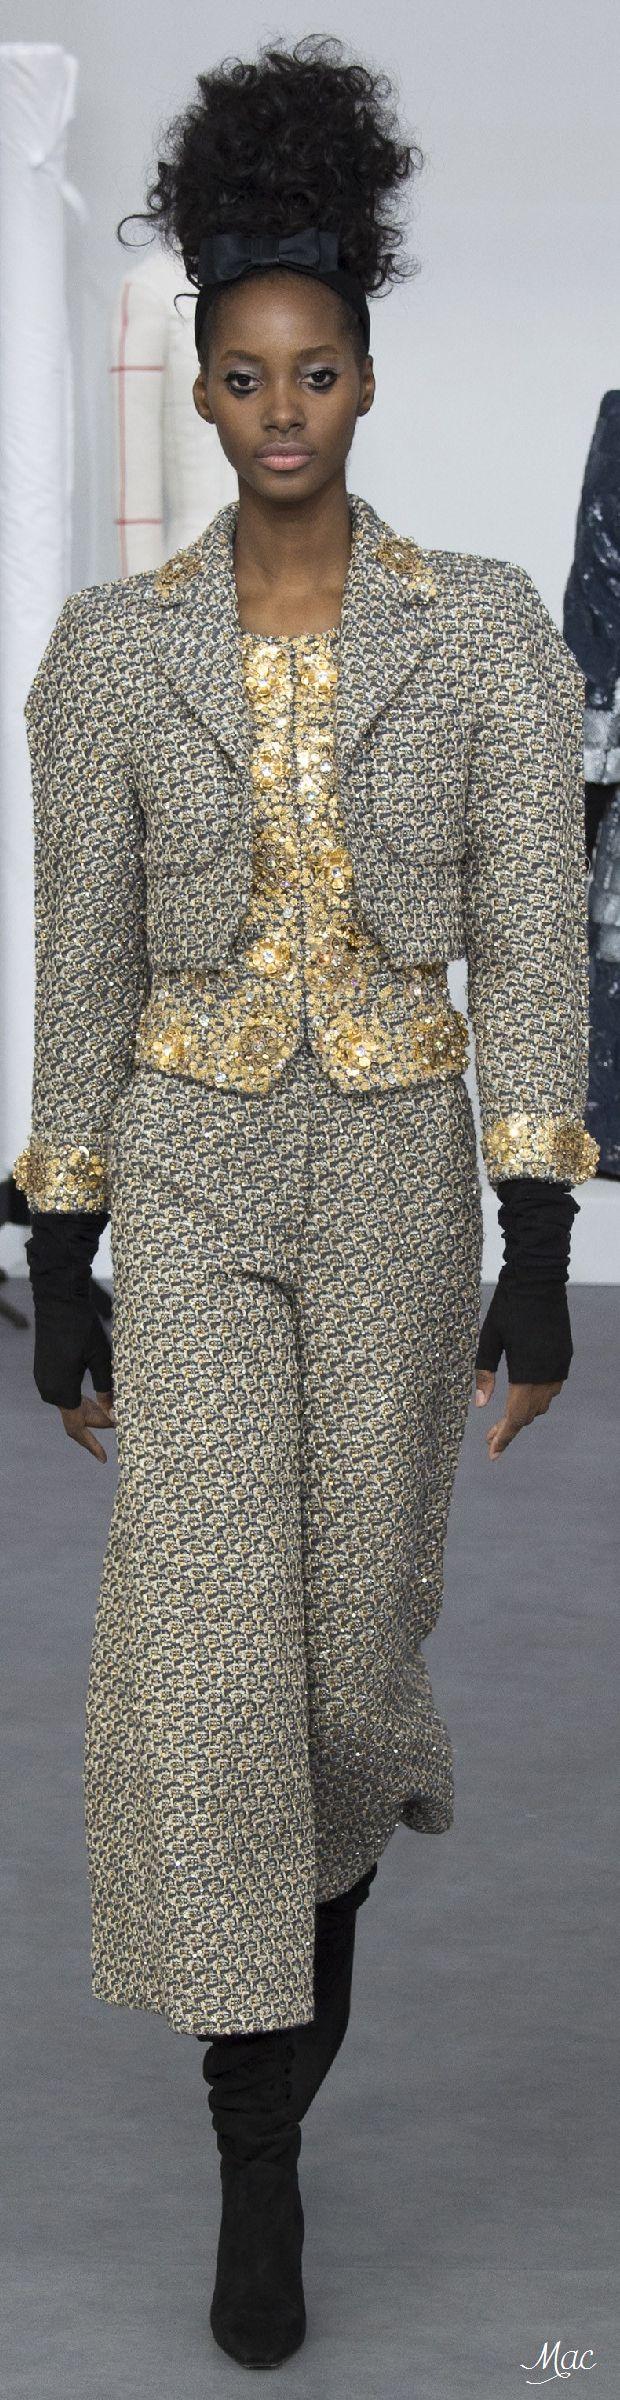 Fall 2016 Haute Couture - Chanel                                                                                                                                                      More